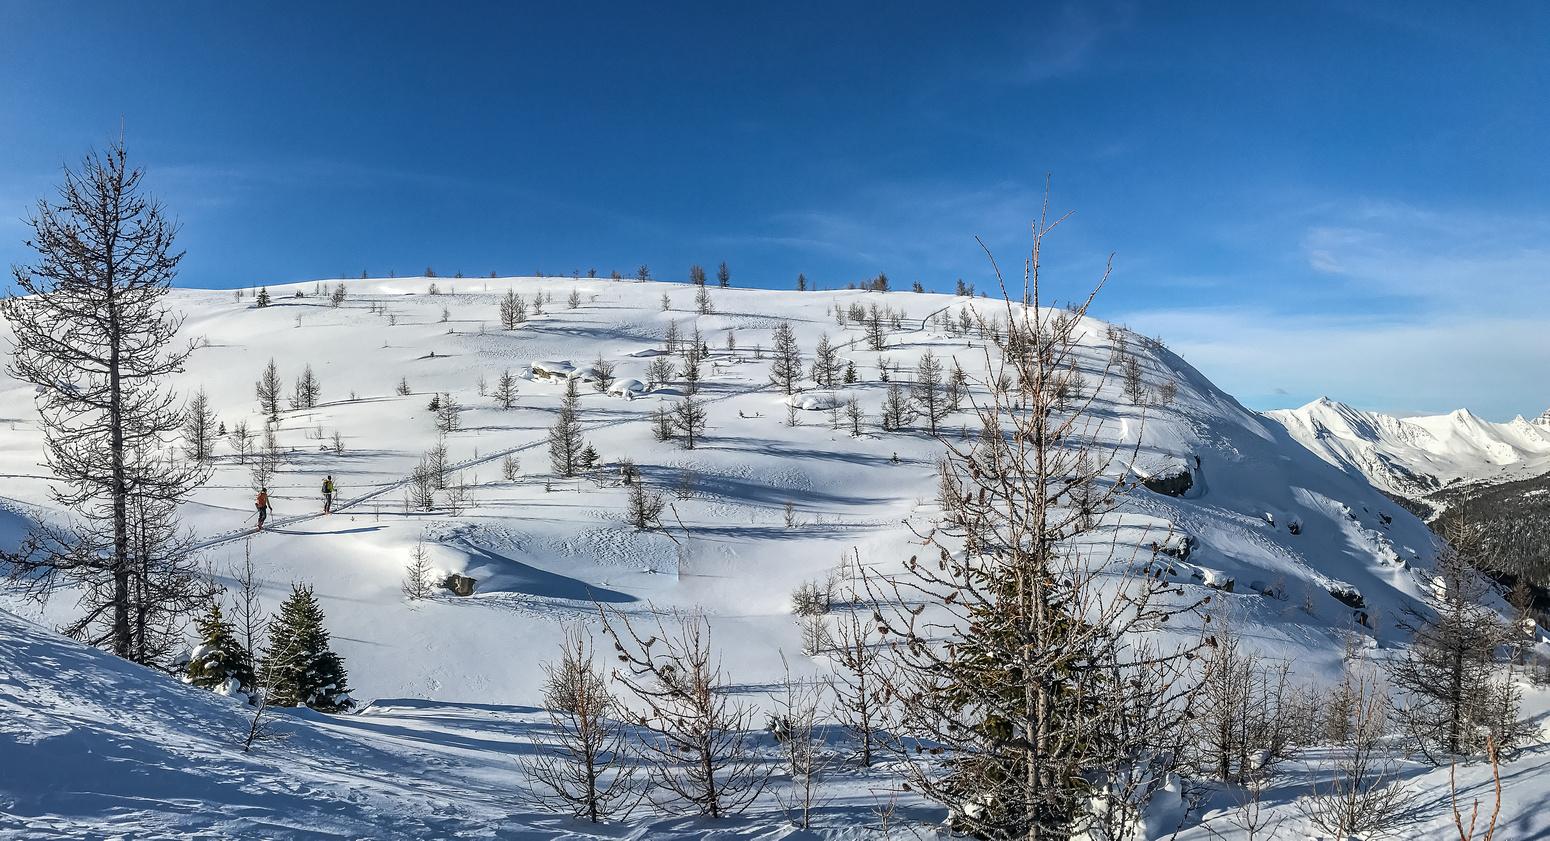 It was a perfect ski day.